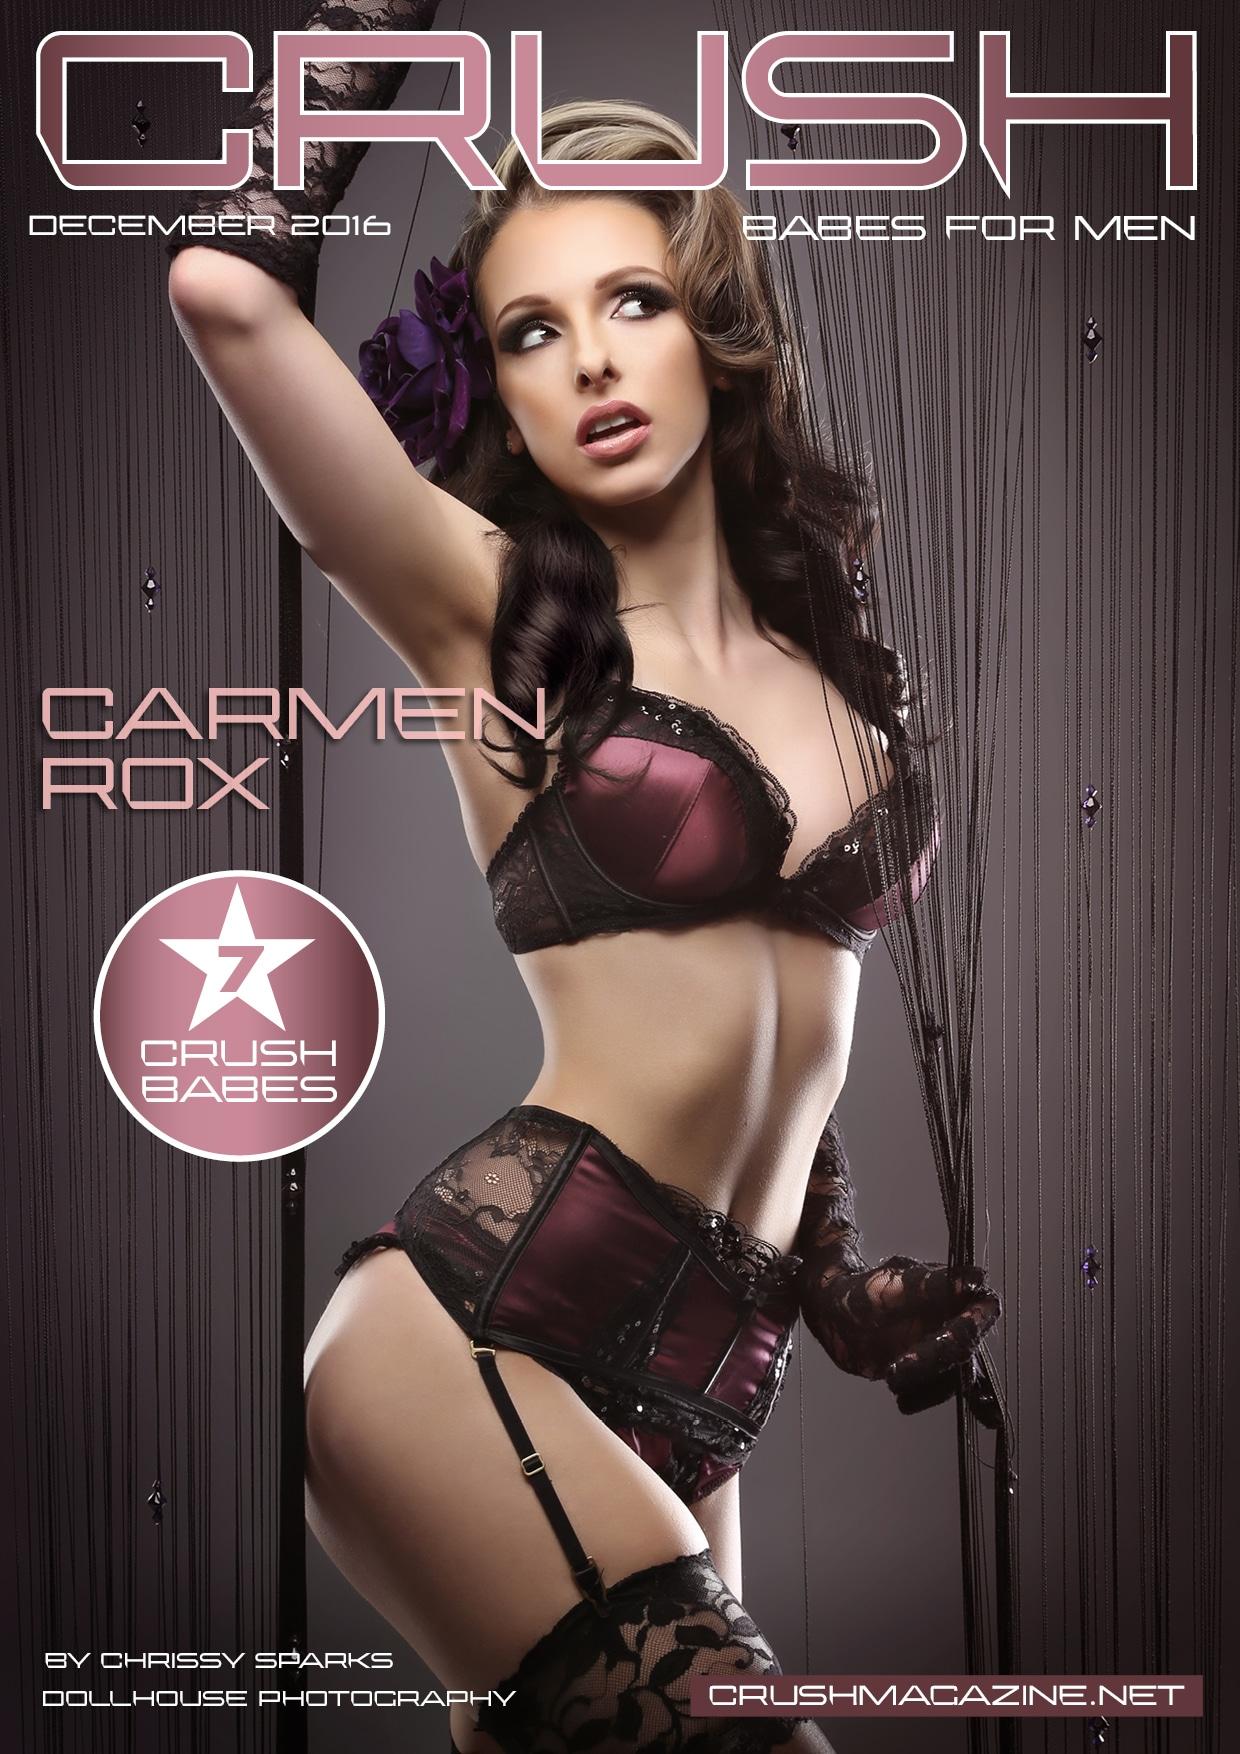 Crush Magazine - December 2016 - Part 1 - Carmen Rox 1